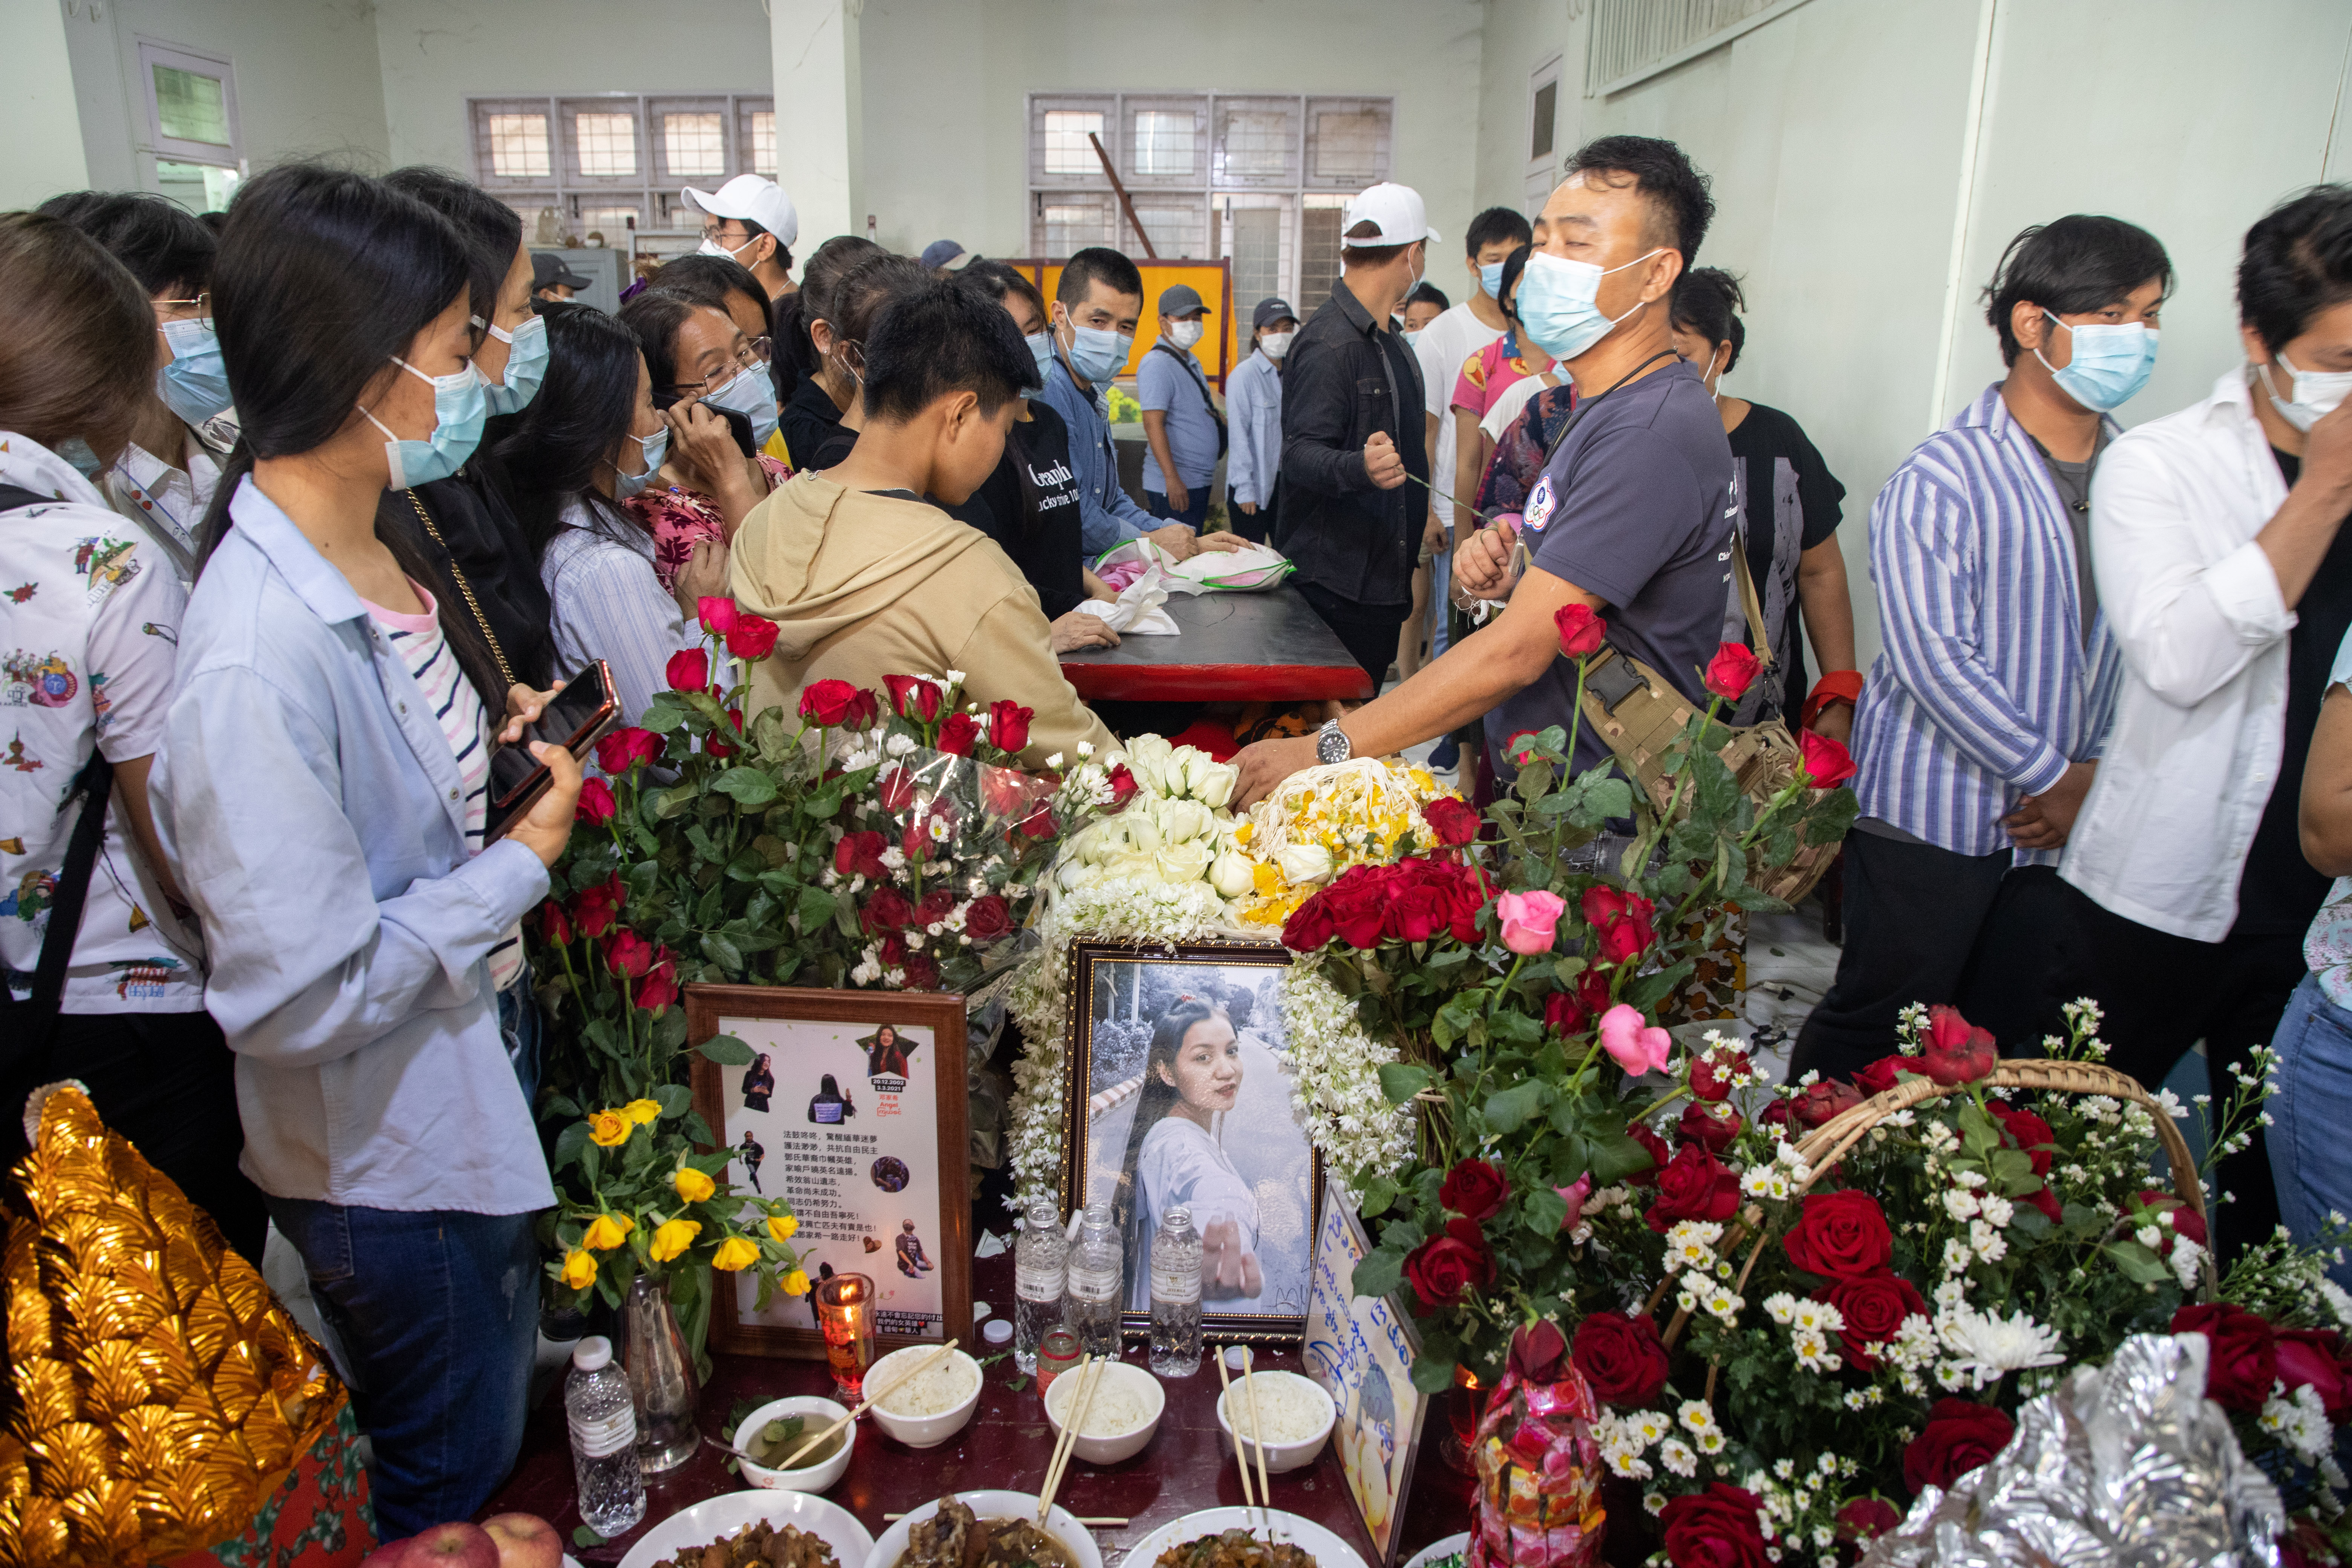 Angel's funeral. PHOTO: STRINGER